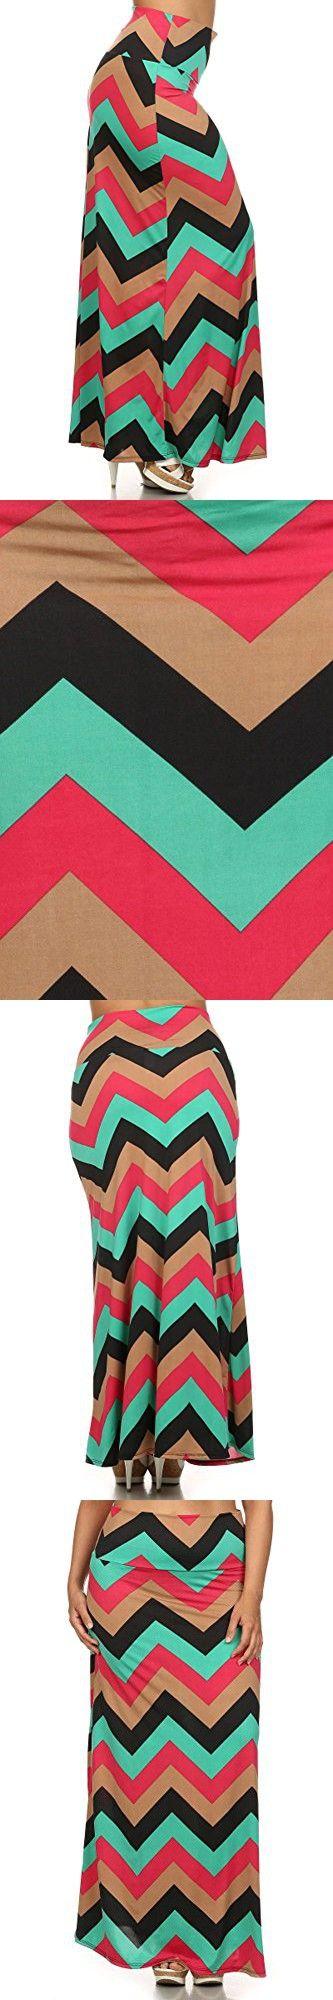 (Plus Size) Chevron Print High Waist Self Banded Maxi Skirt (MADE IN U.S.A)